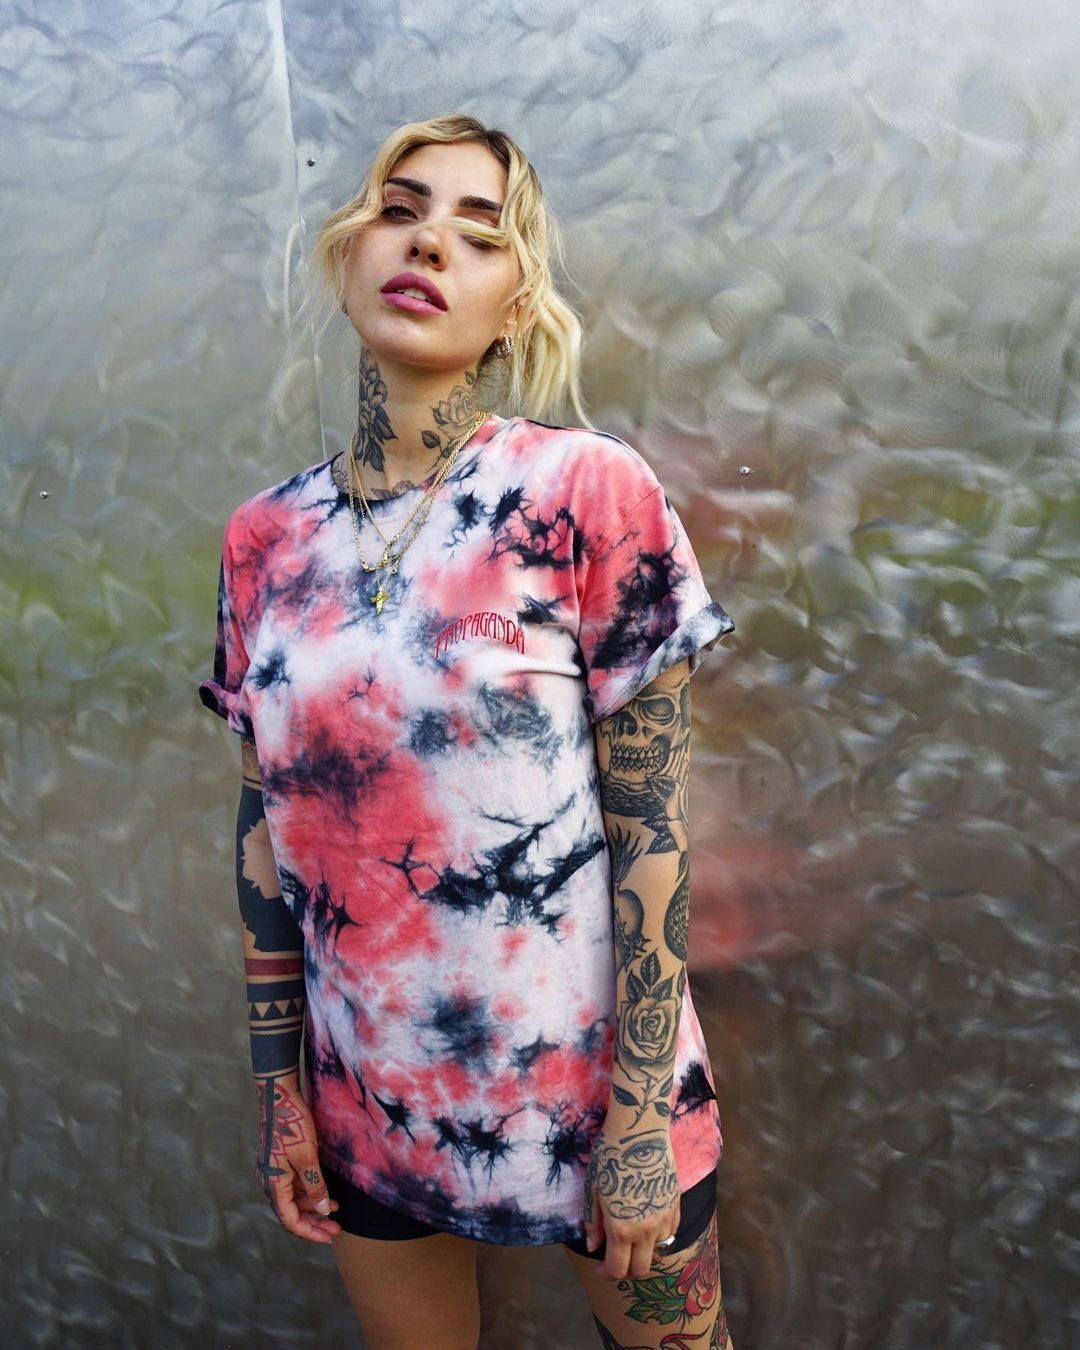 Ludovica-Melisurgo-Wallpapers-Insta-Fit-BIo-3